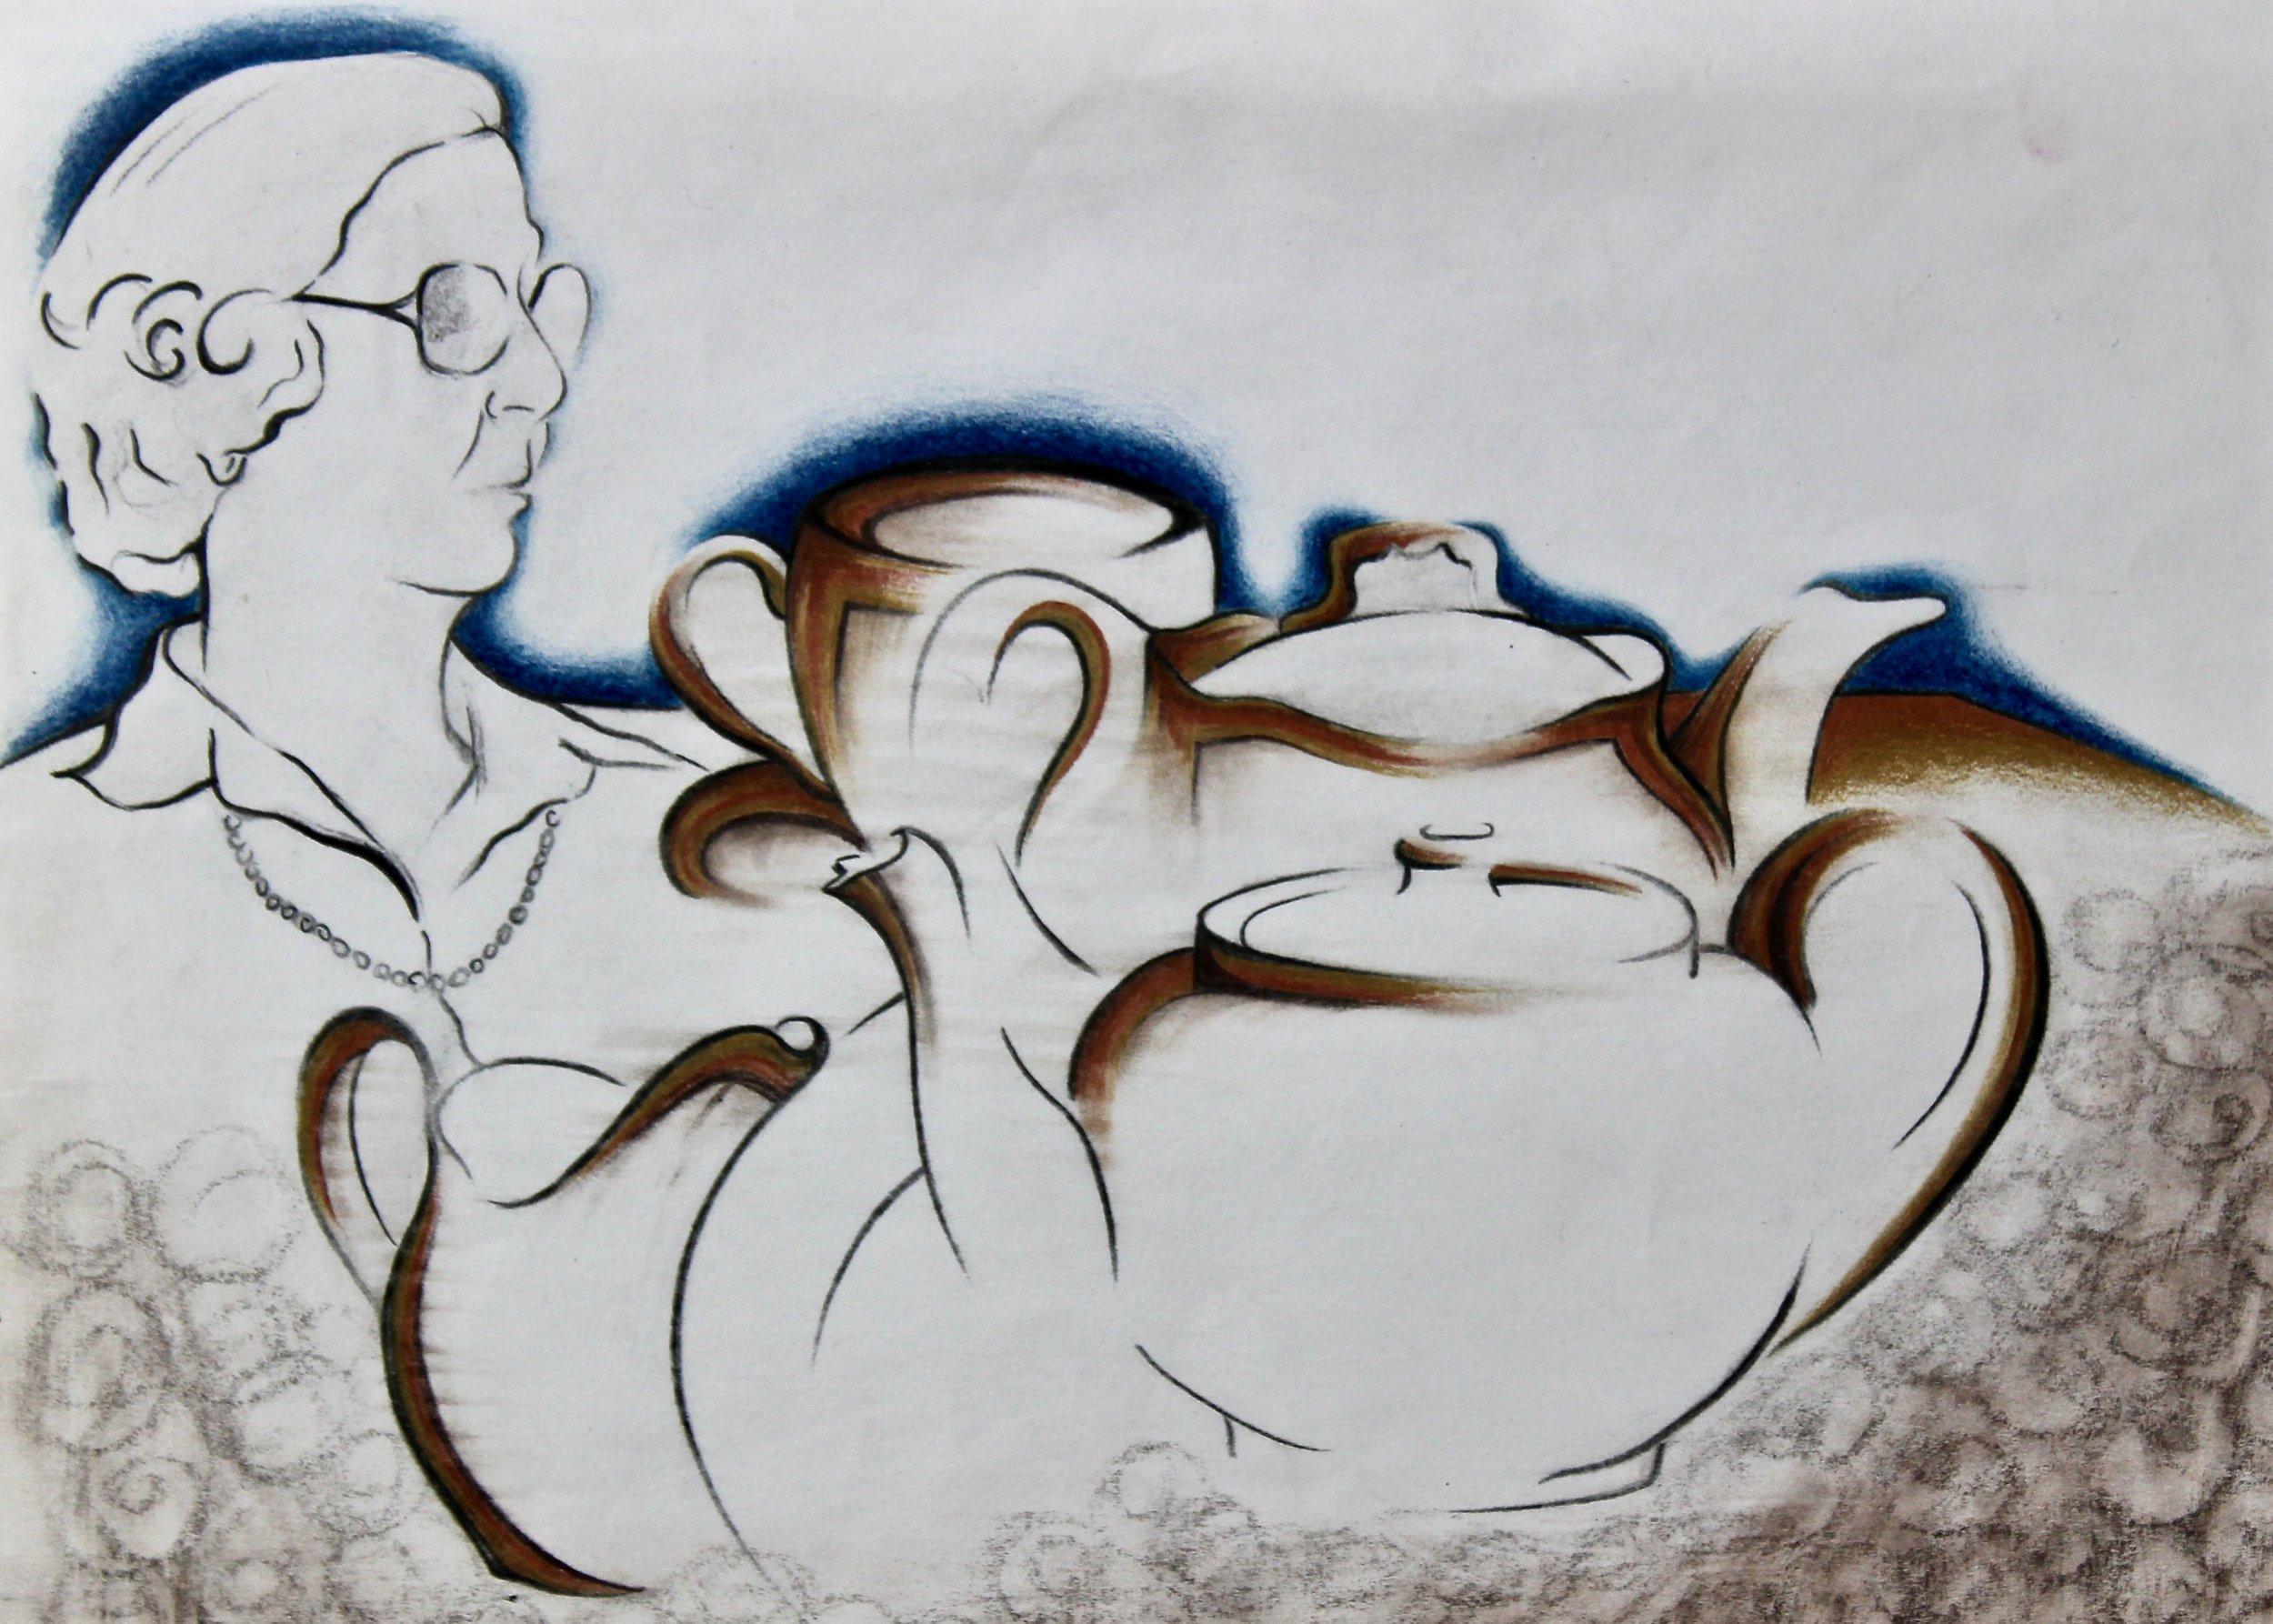 Tea with Gran Gran -  1991 pencil and watercolour on paper 20cm x 26cm